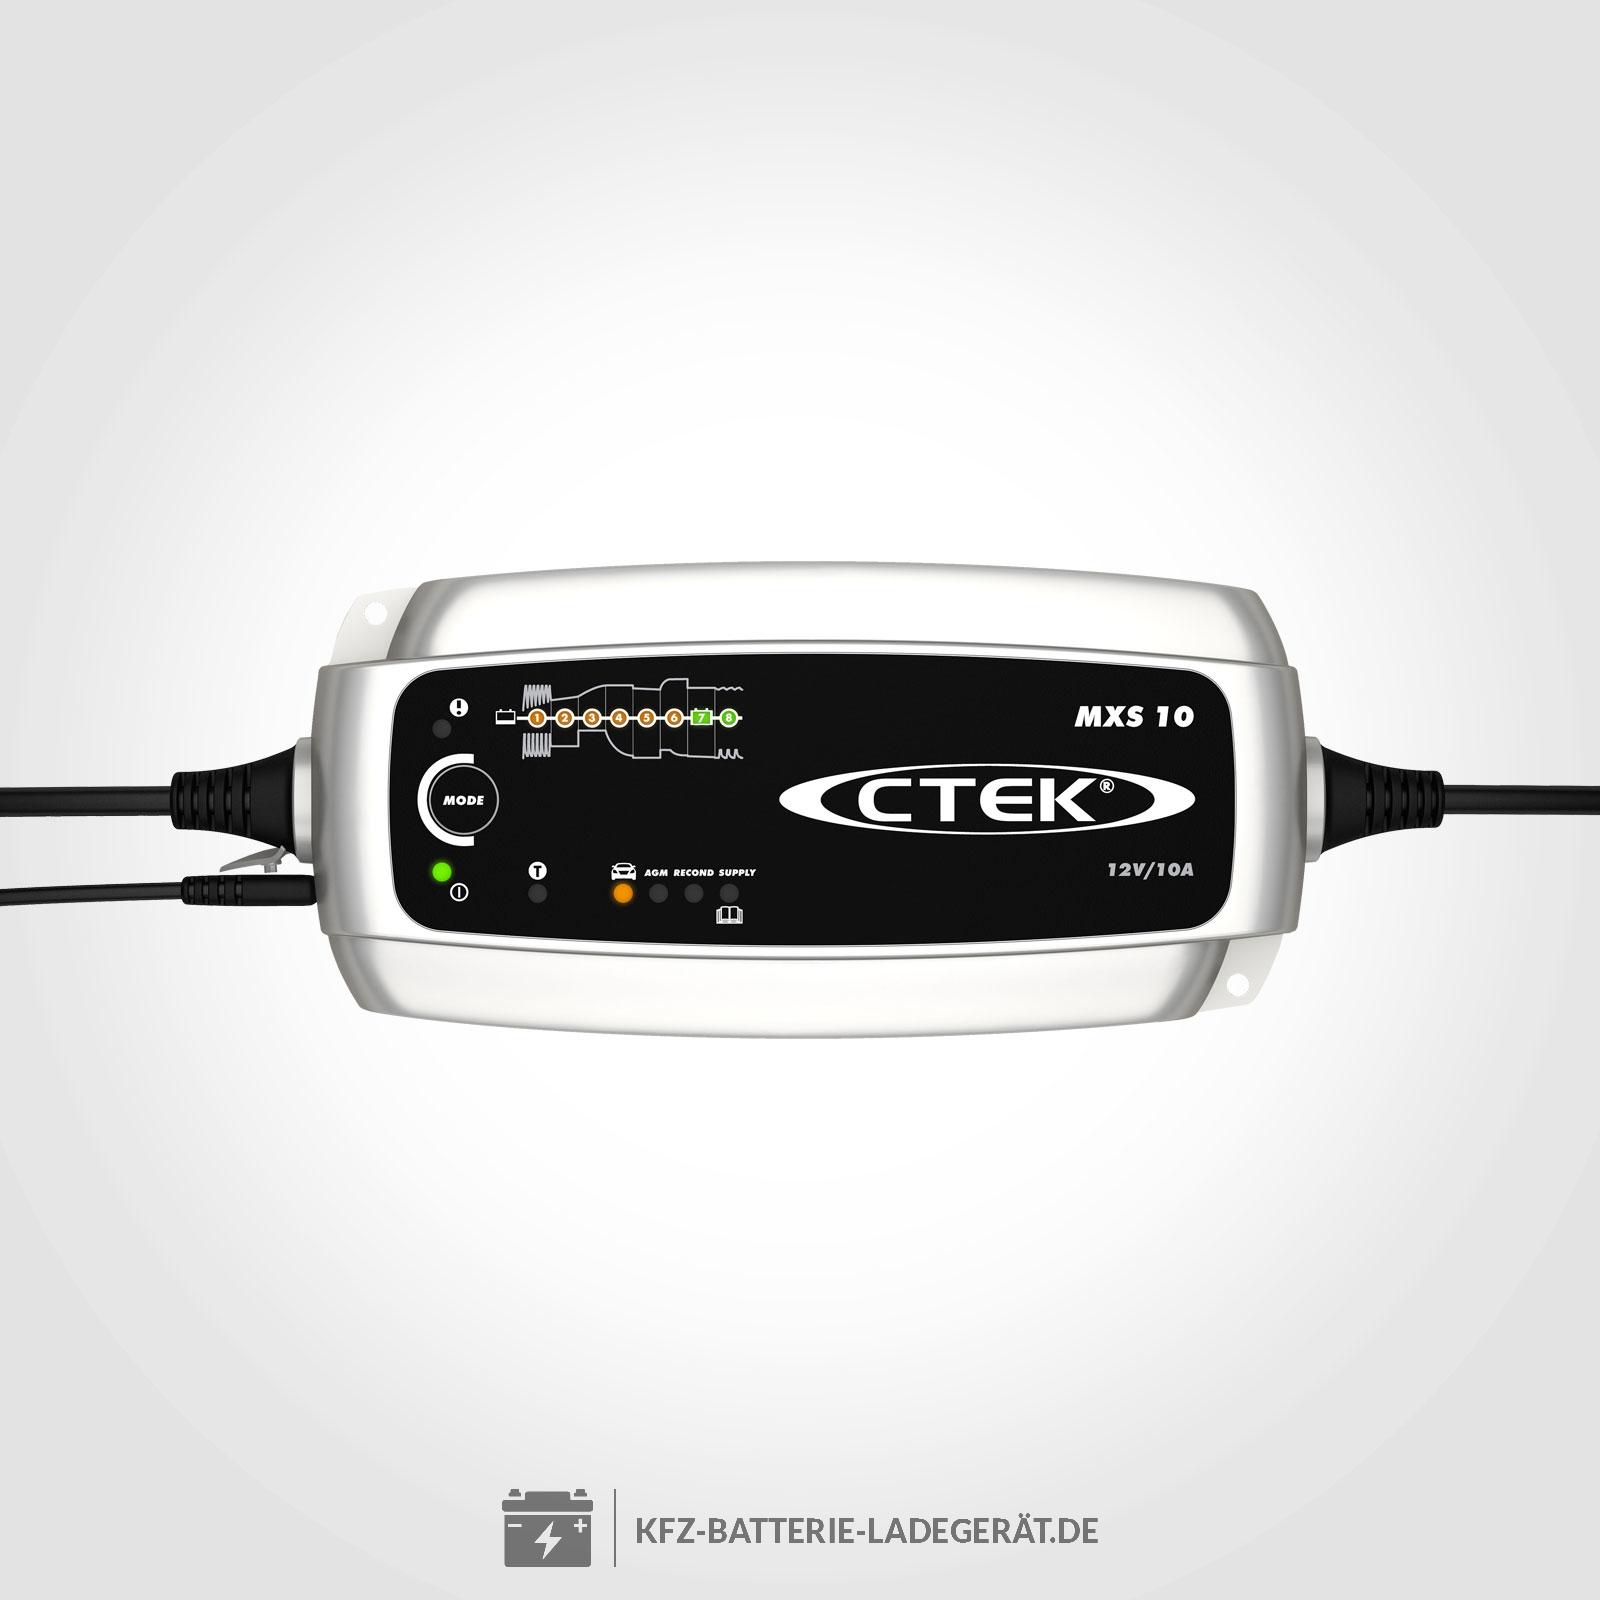 Ctek Mxs10 Ladegerät Für 12 Volt Batterien Ctek Batterie Ladegeräte